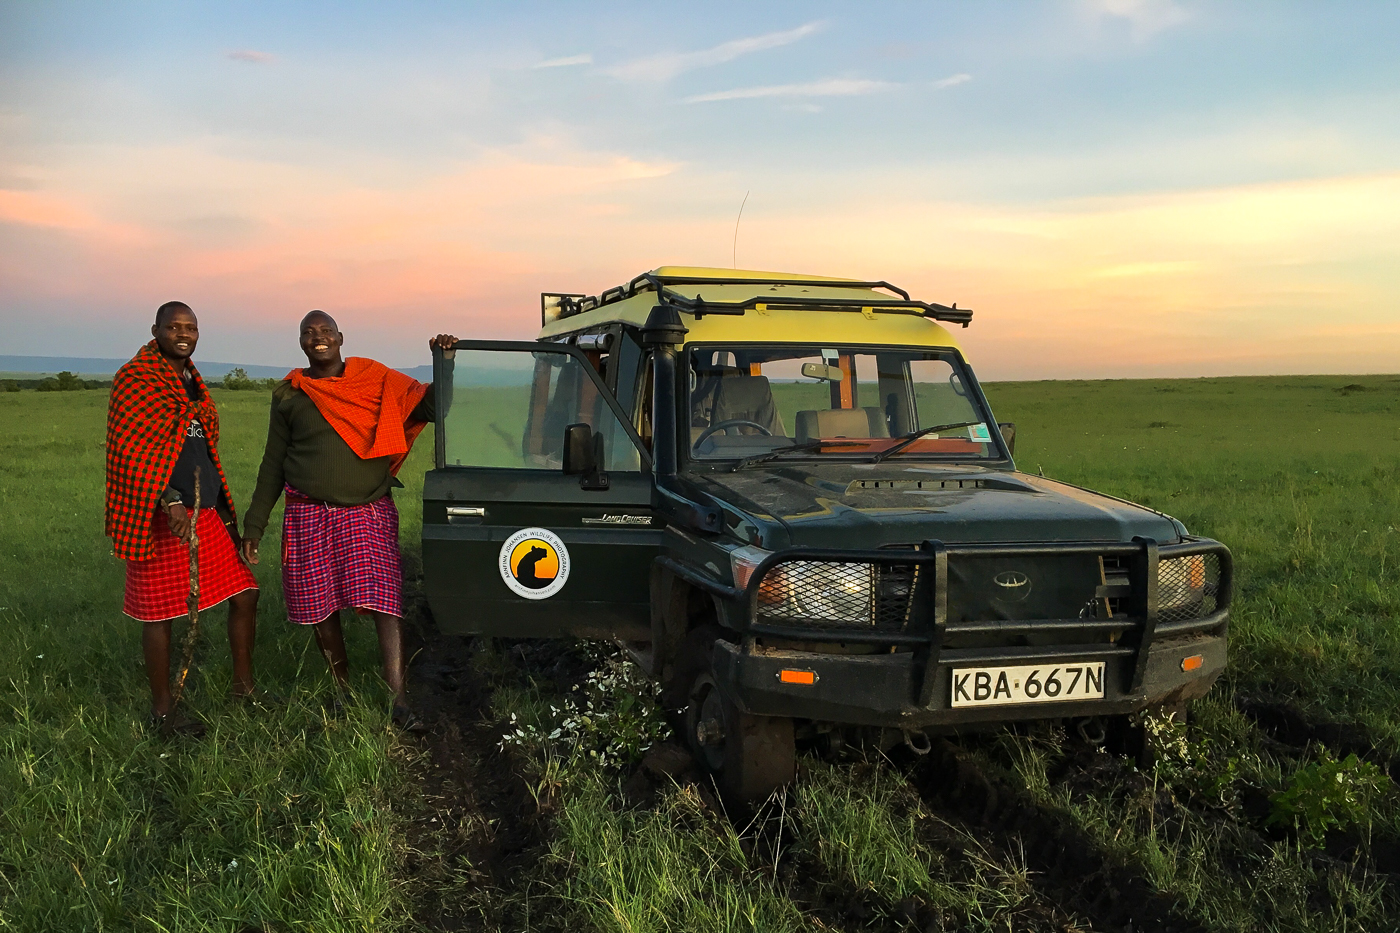 Modified Landcruiser - Img 1 - Oltepesi Tented Safari Camp